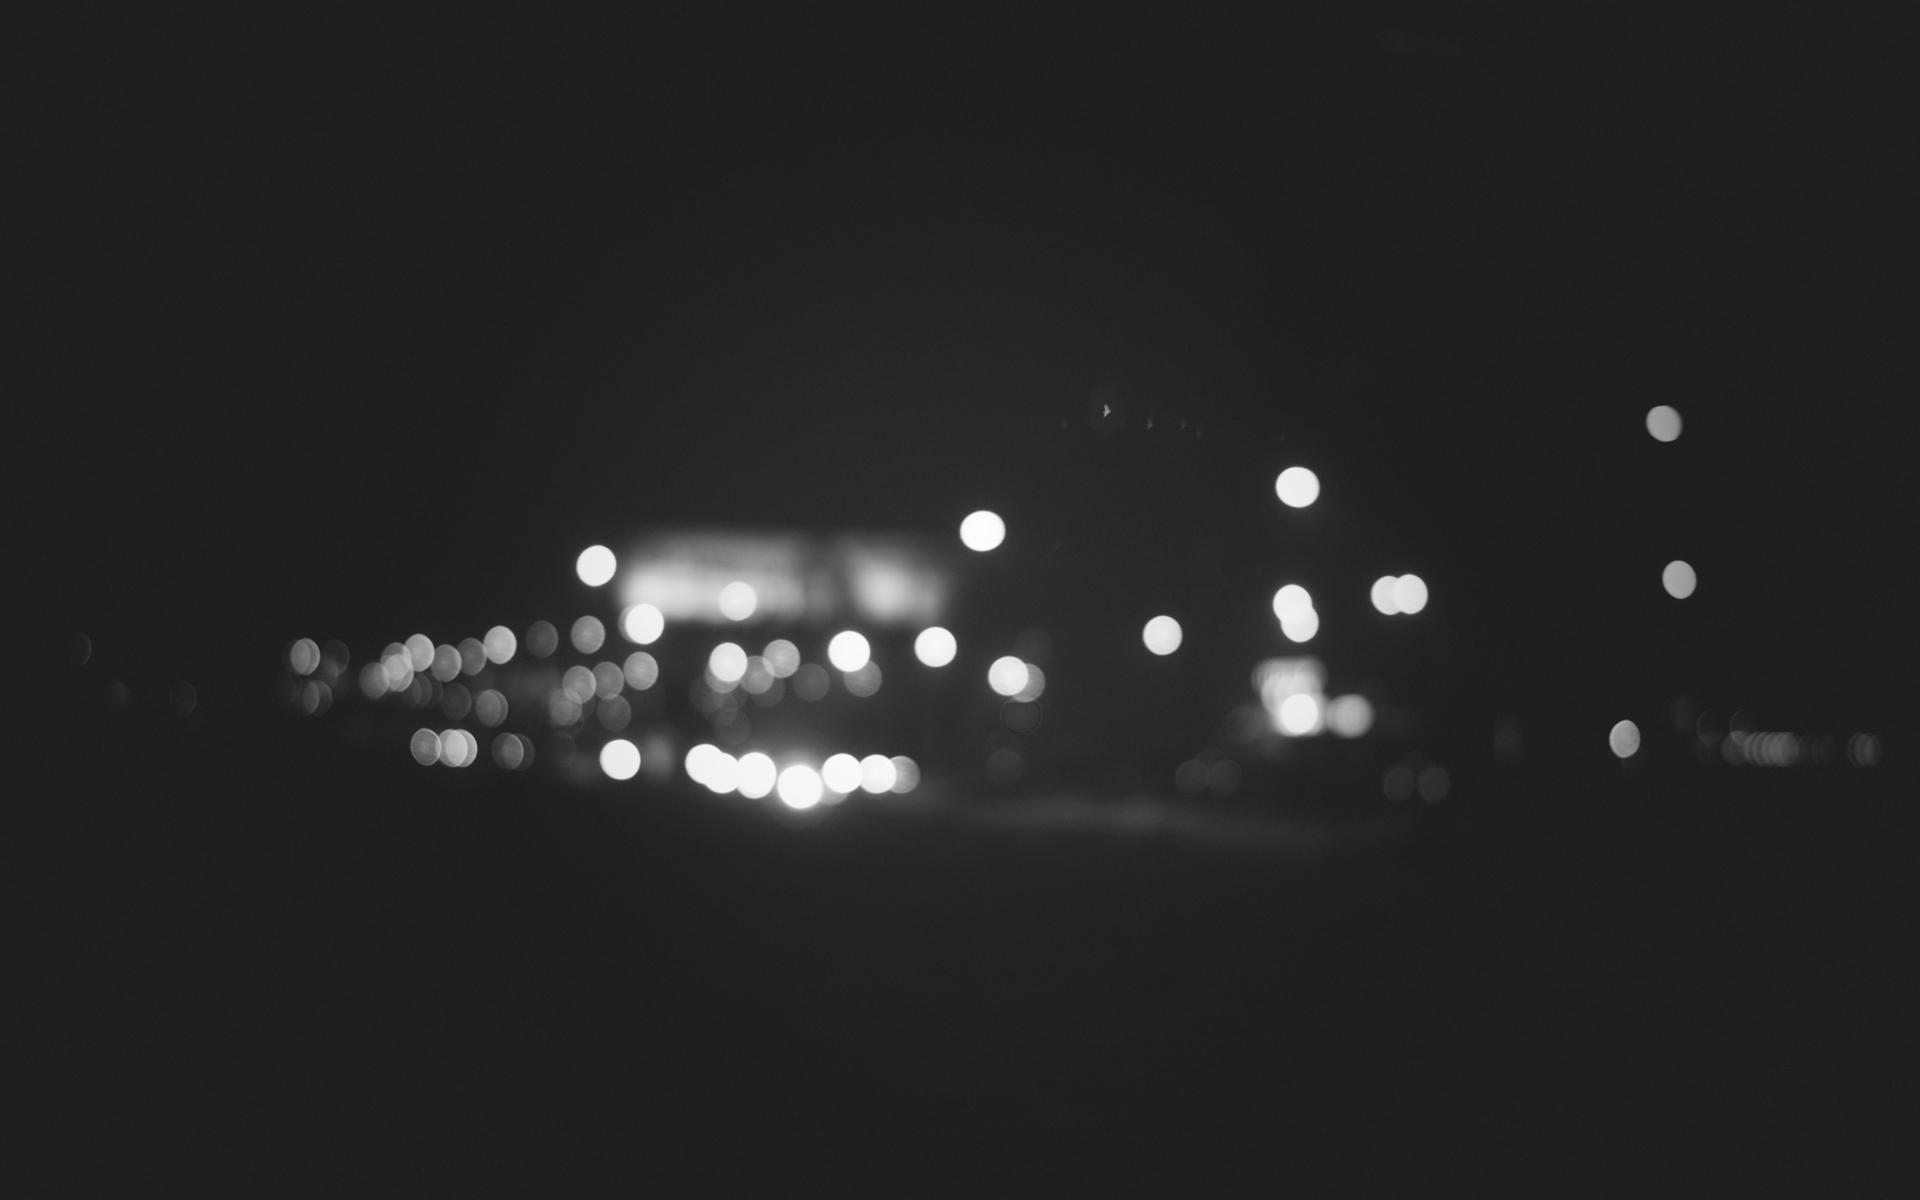 General 1920x1200 blurred photography bokeh monochrome